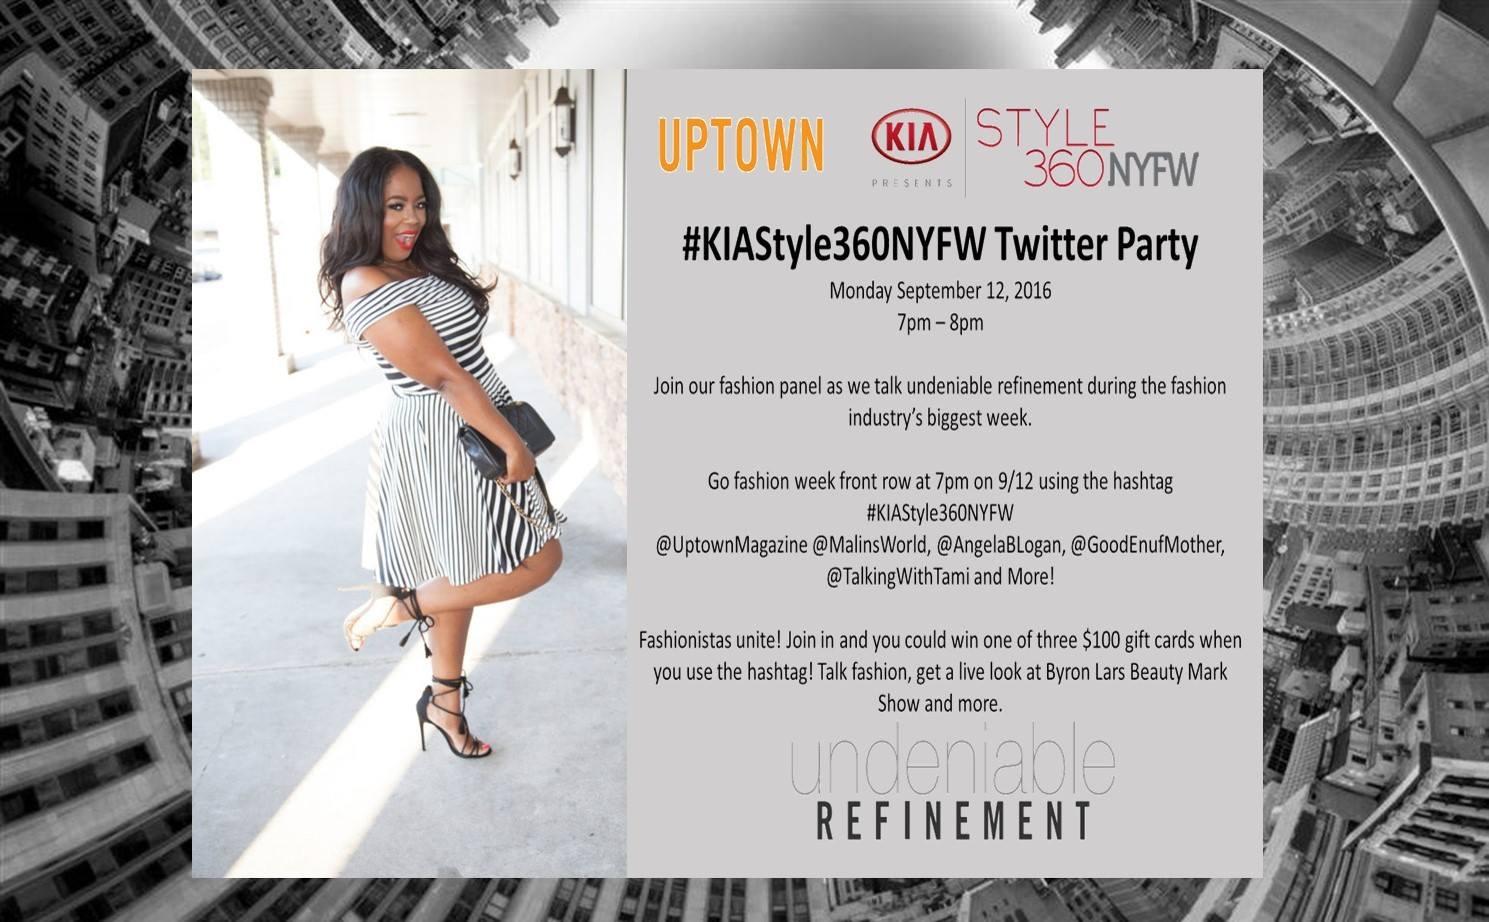 Join Me: UPTOWN + #KiaStyle360NYFW TWITTER PARTY